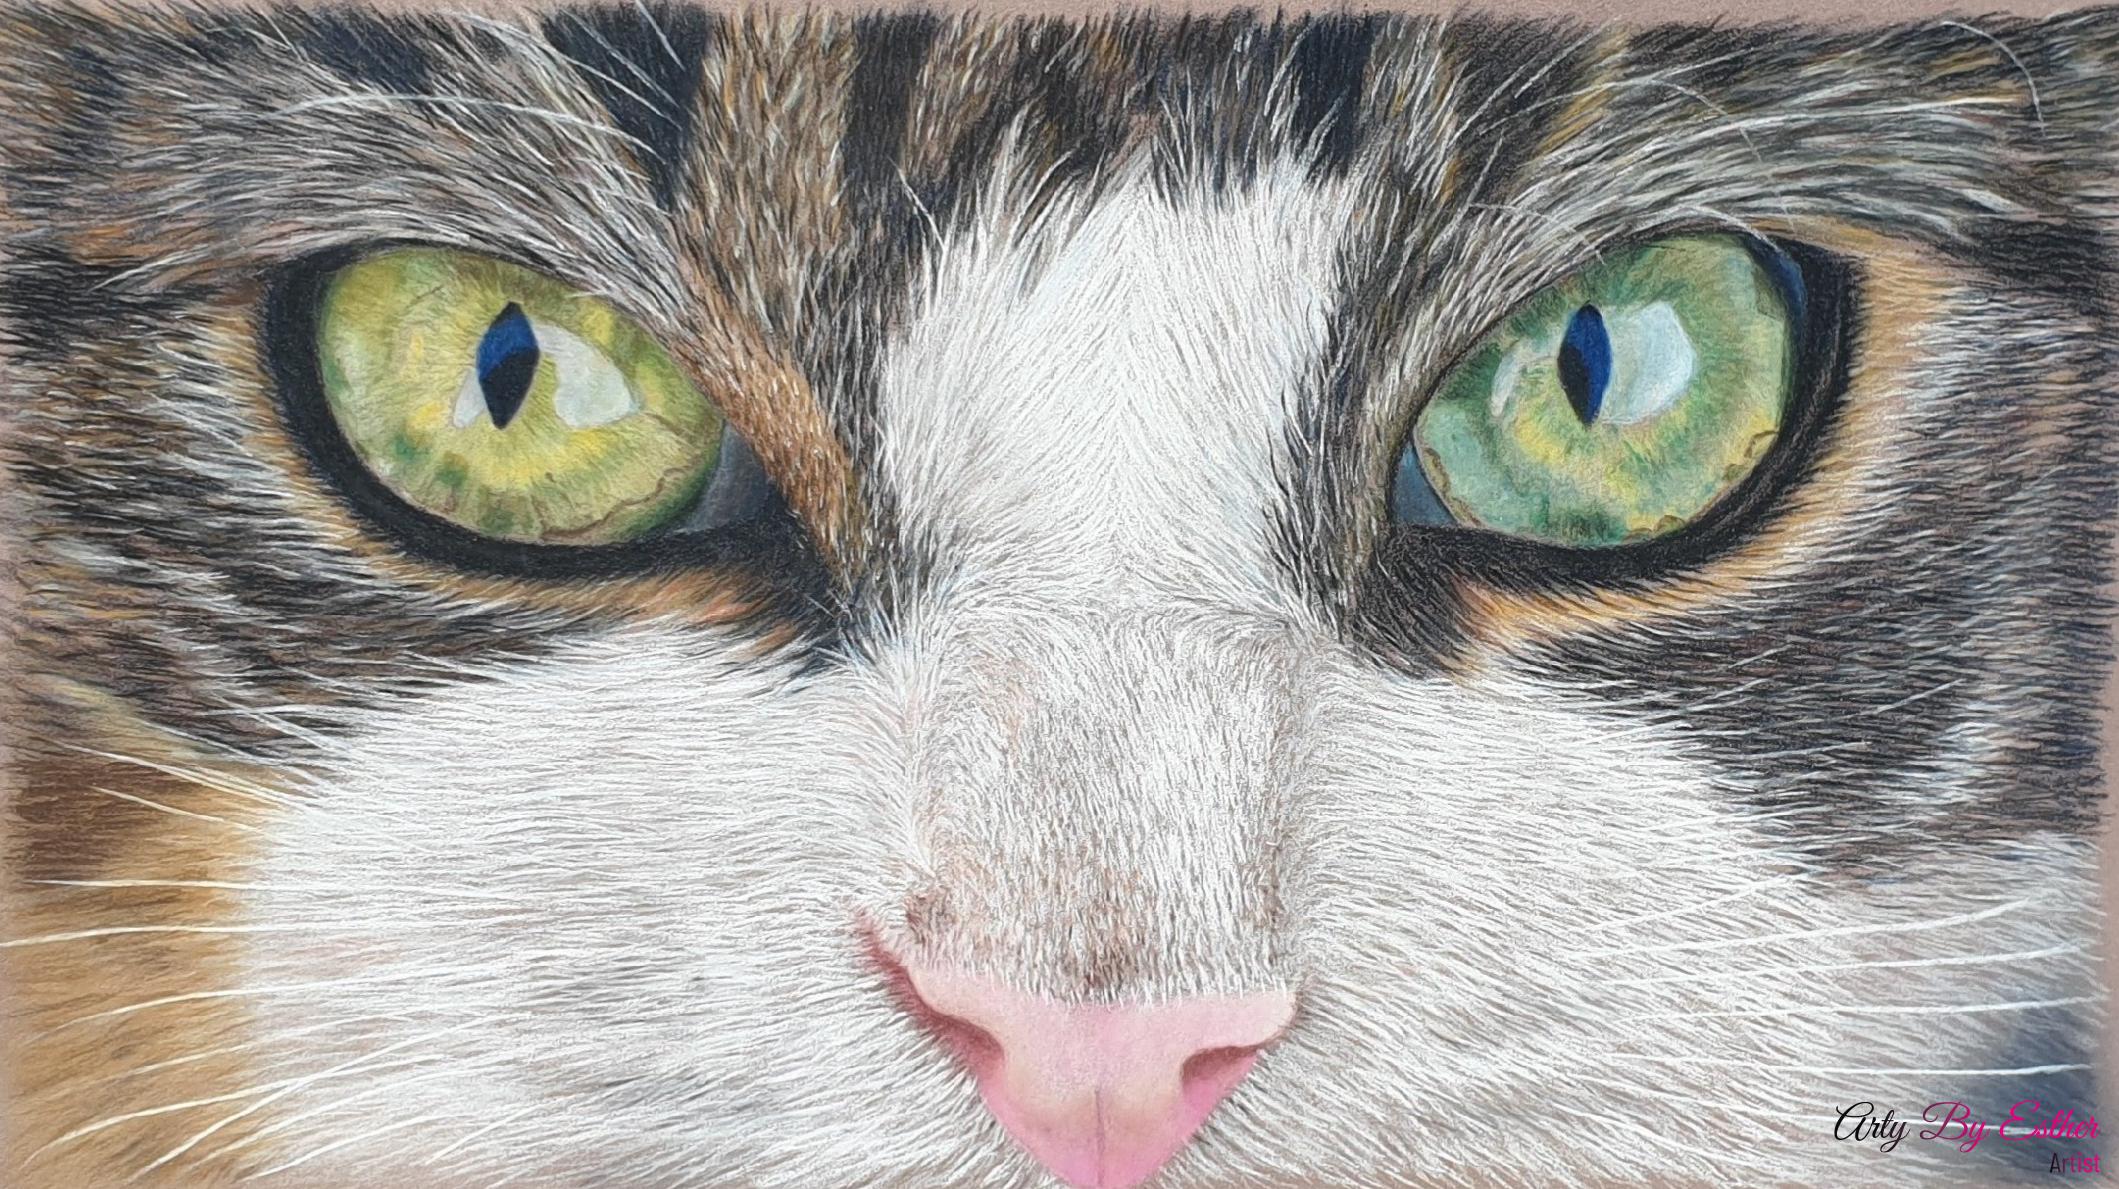 Caspertje pastelpainting Cat